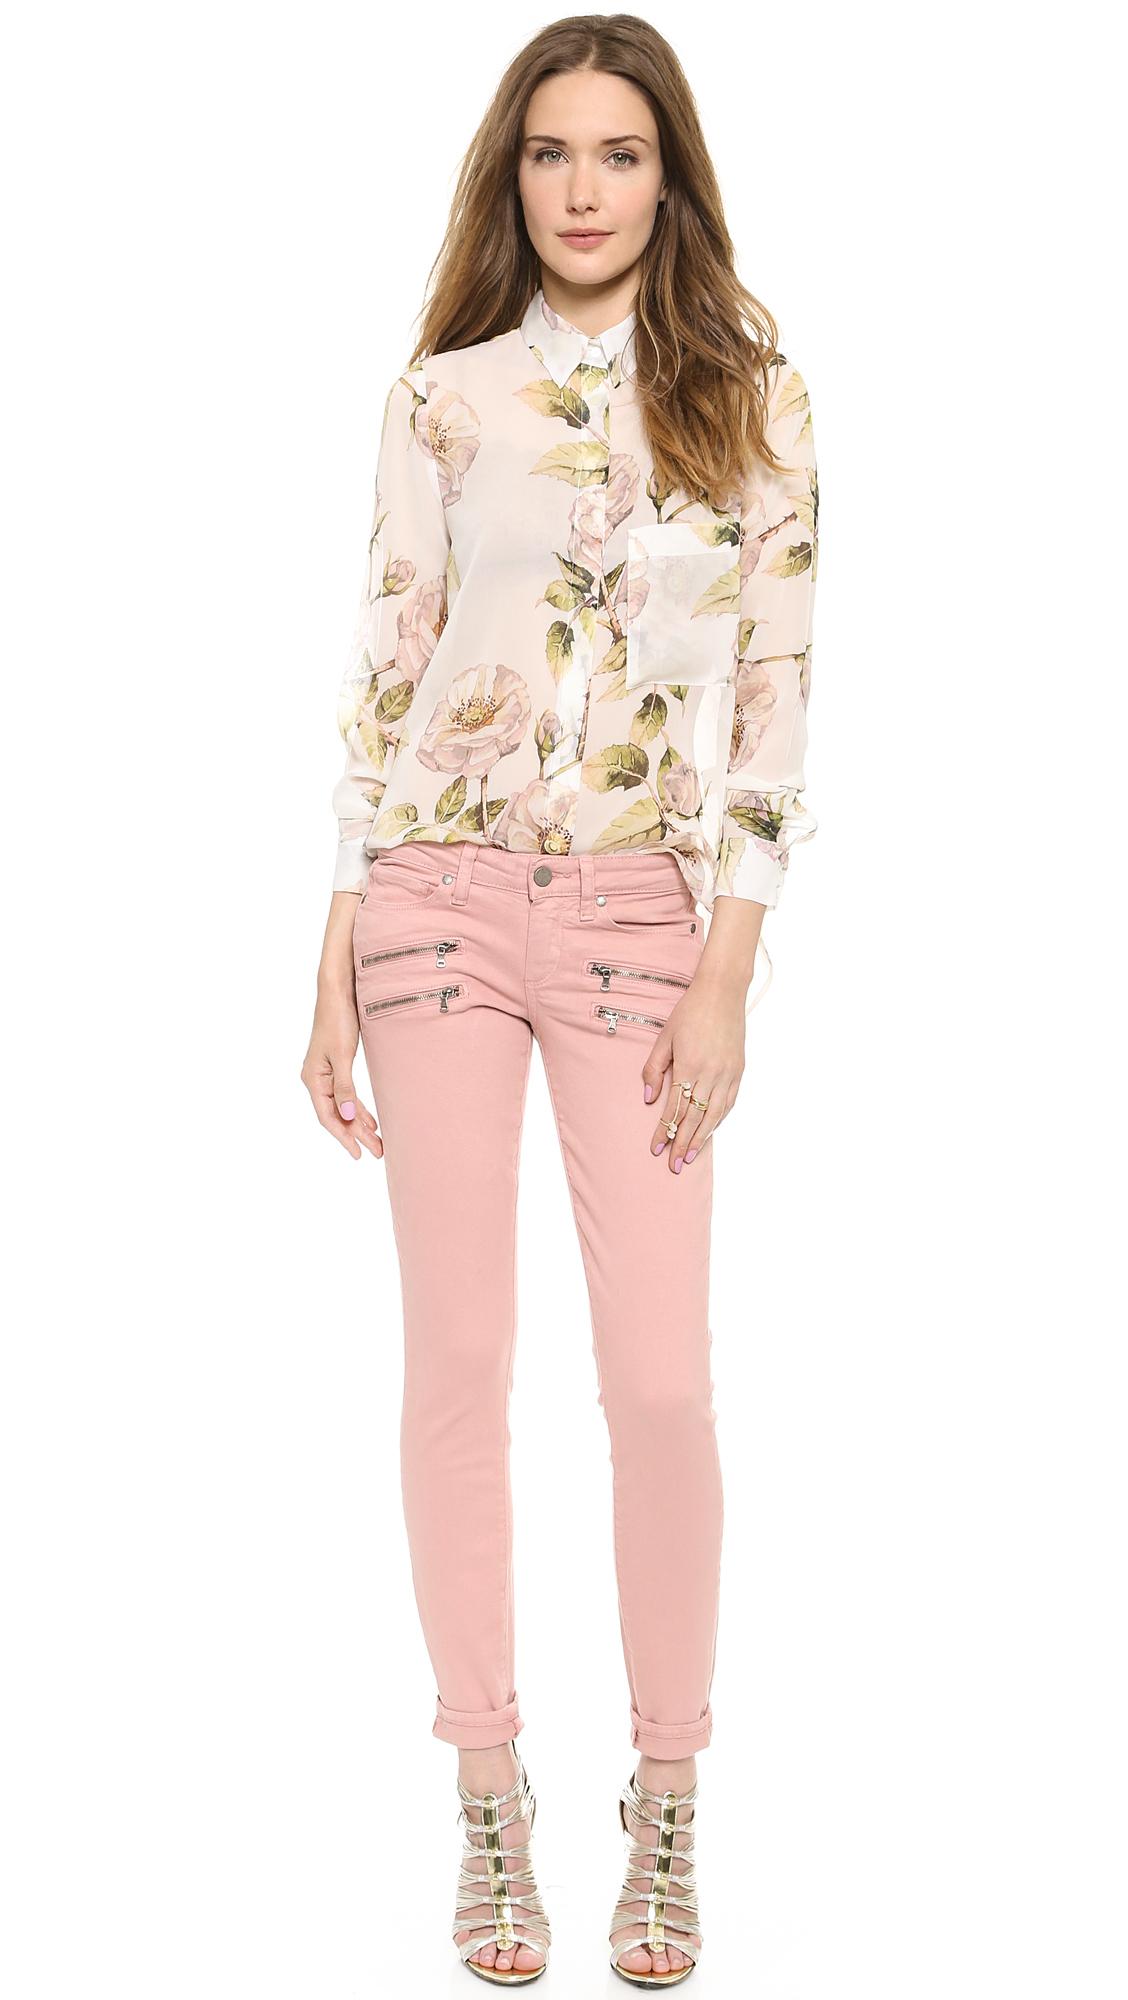 PAIGE Edgemont Ultra Skinny Jeans Ballet Pink